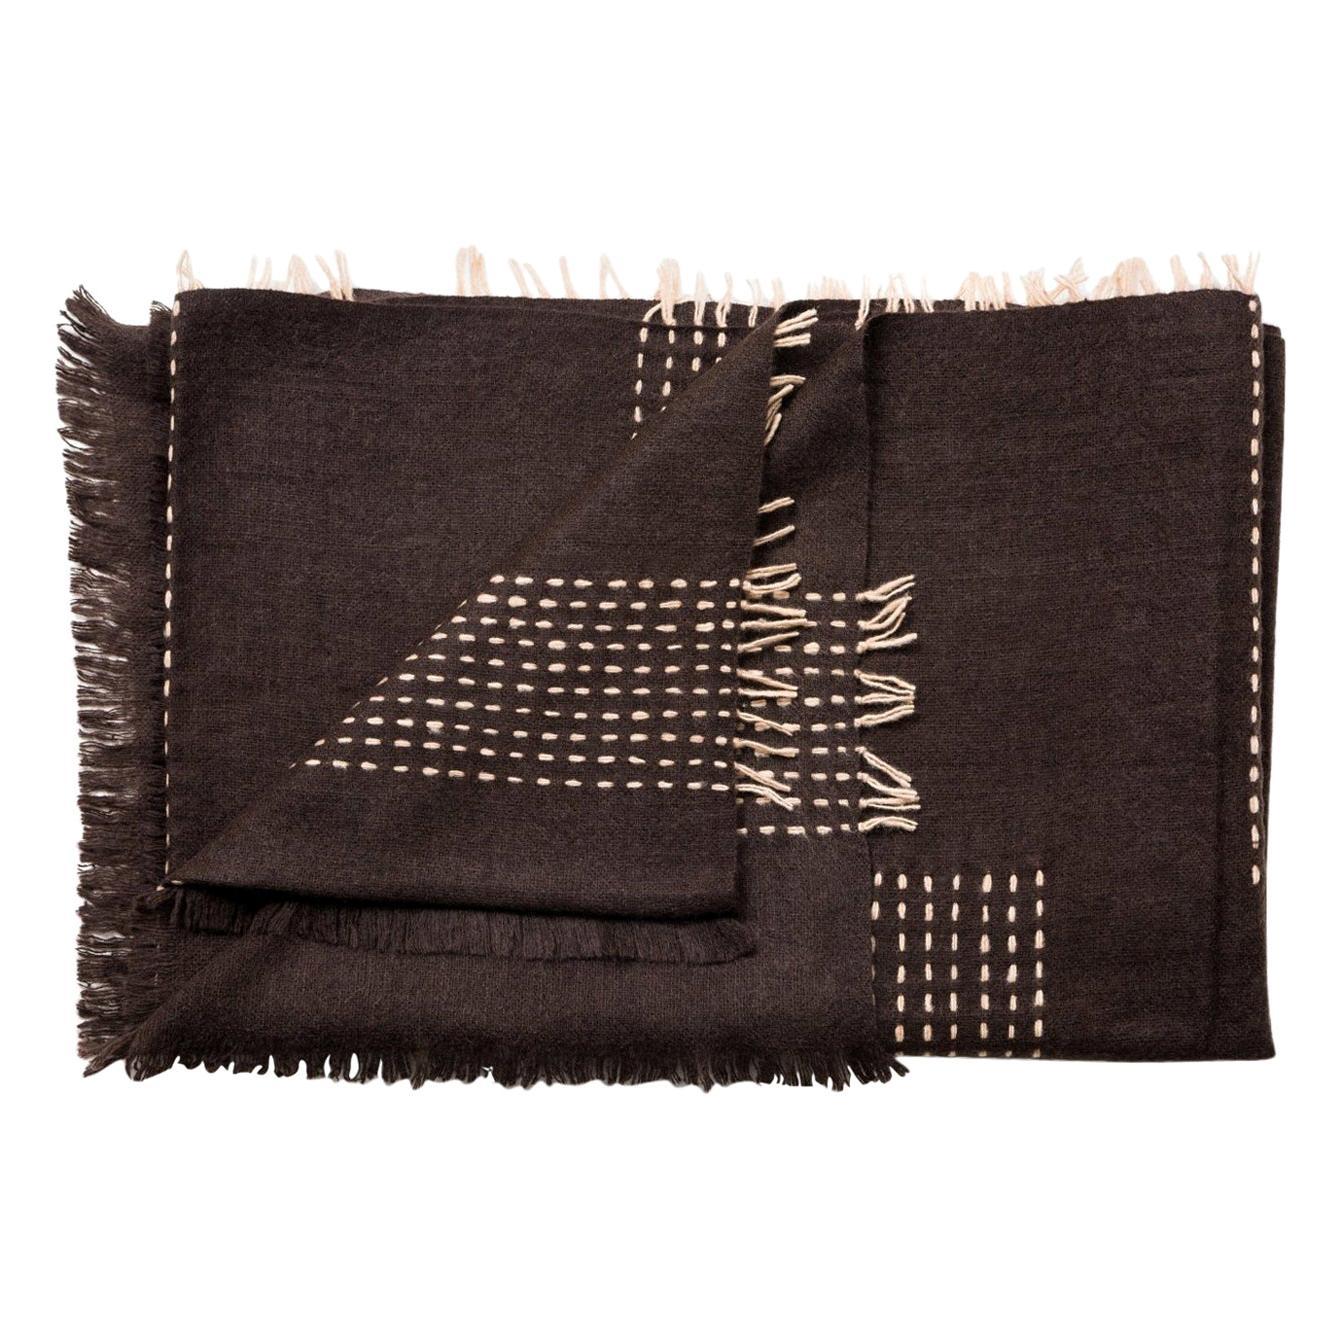 Walnut Dark Brown Handloom Throw / Blanket in Handspun Yak & Stripes Pattern